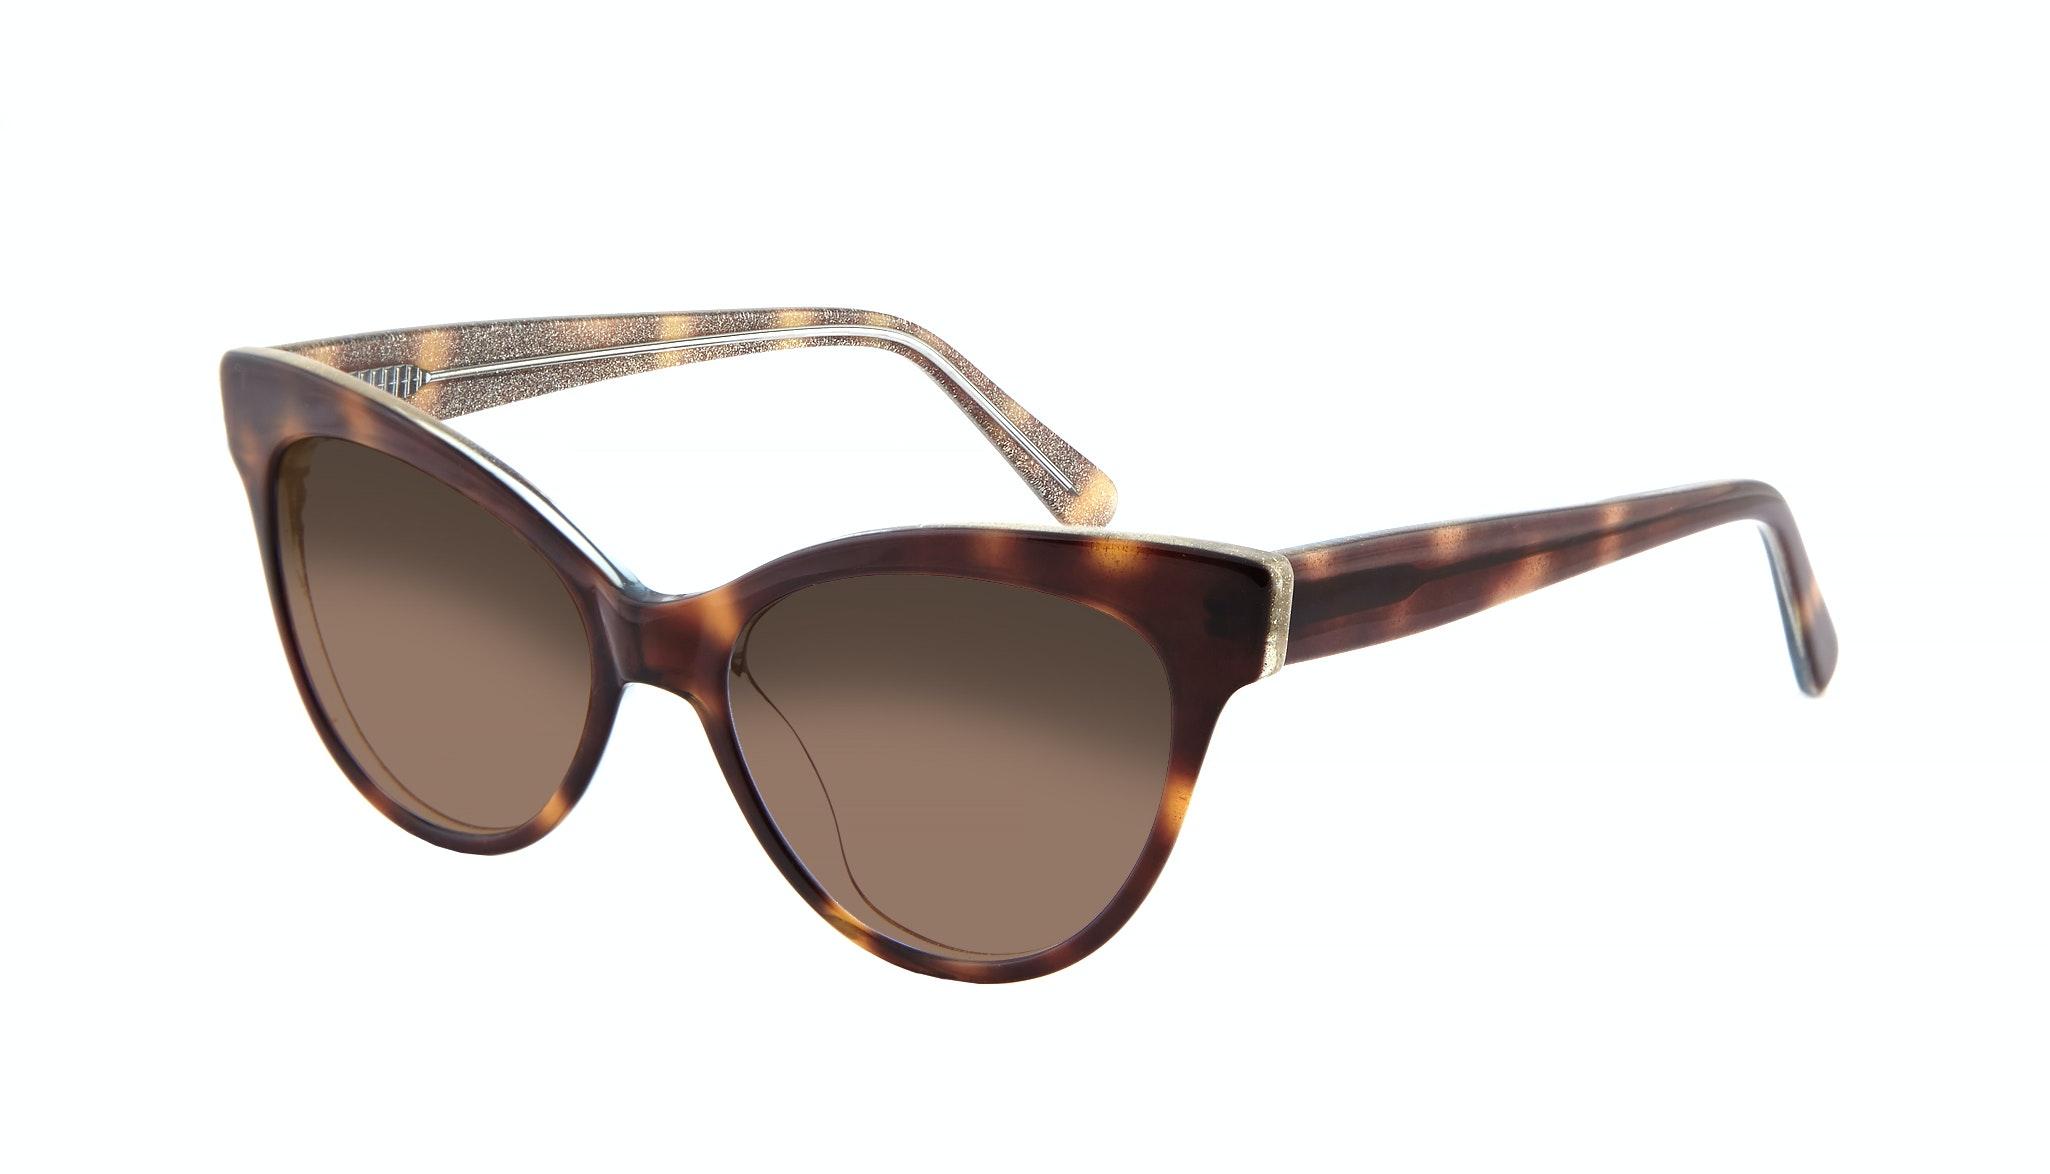 Affordable Fashion Glasses Cat Eye Daring Cateye Sunglasses Women SkunkBoy Twinkle Tort Tilt